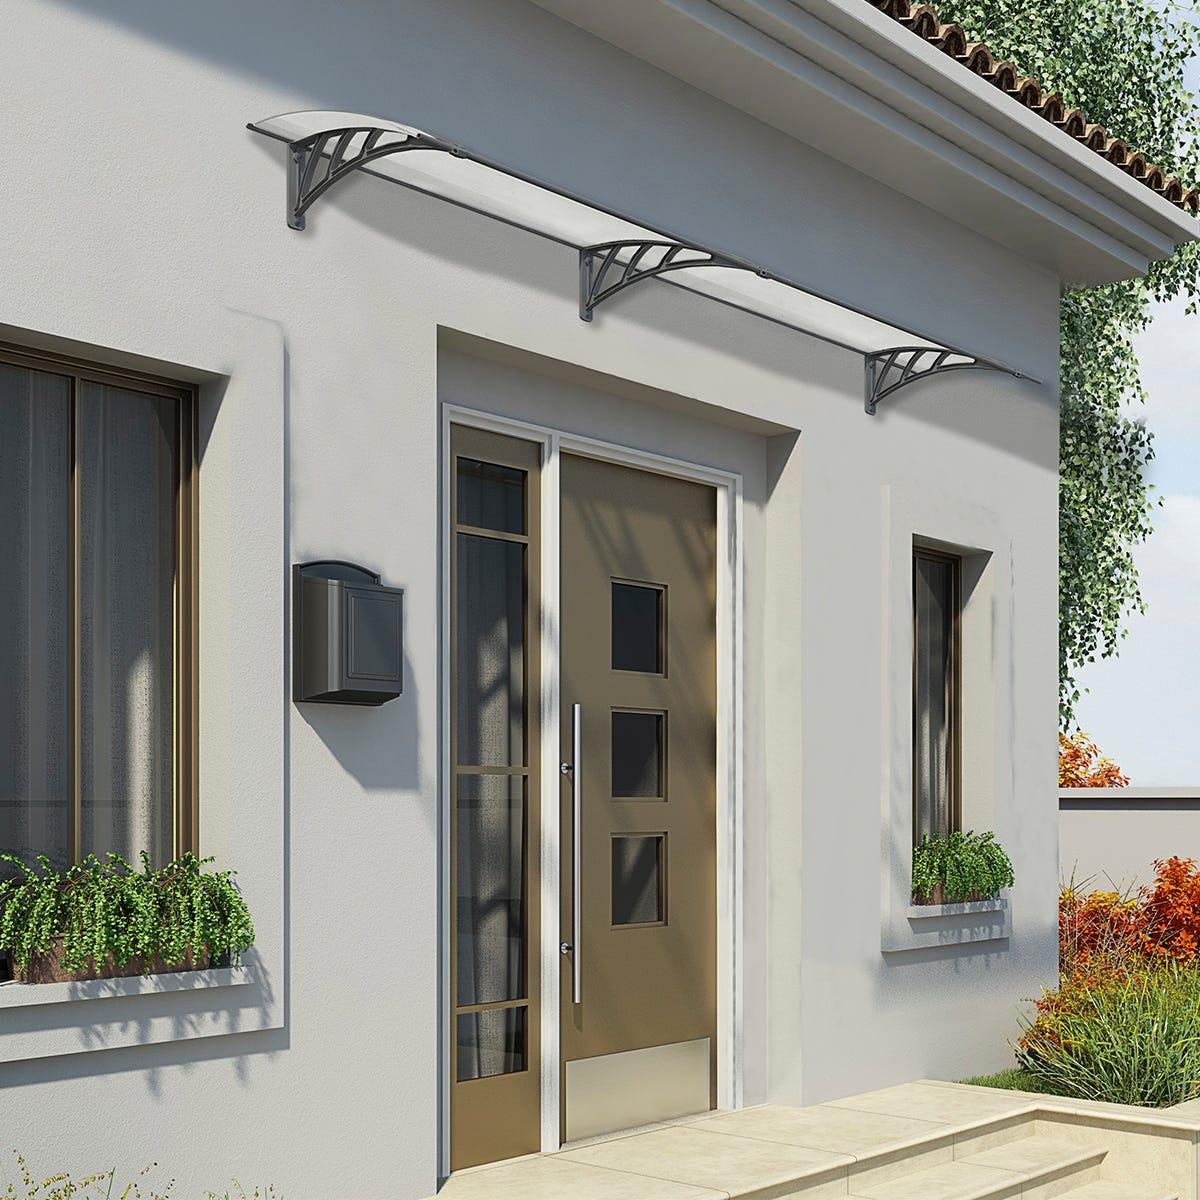 Palram - Canopia Twinwall Canopy Neo 2700 - Grey